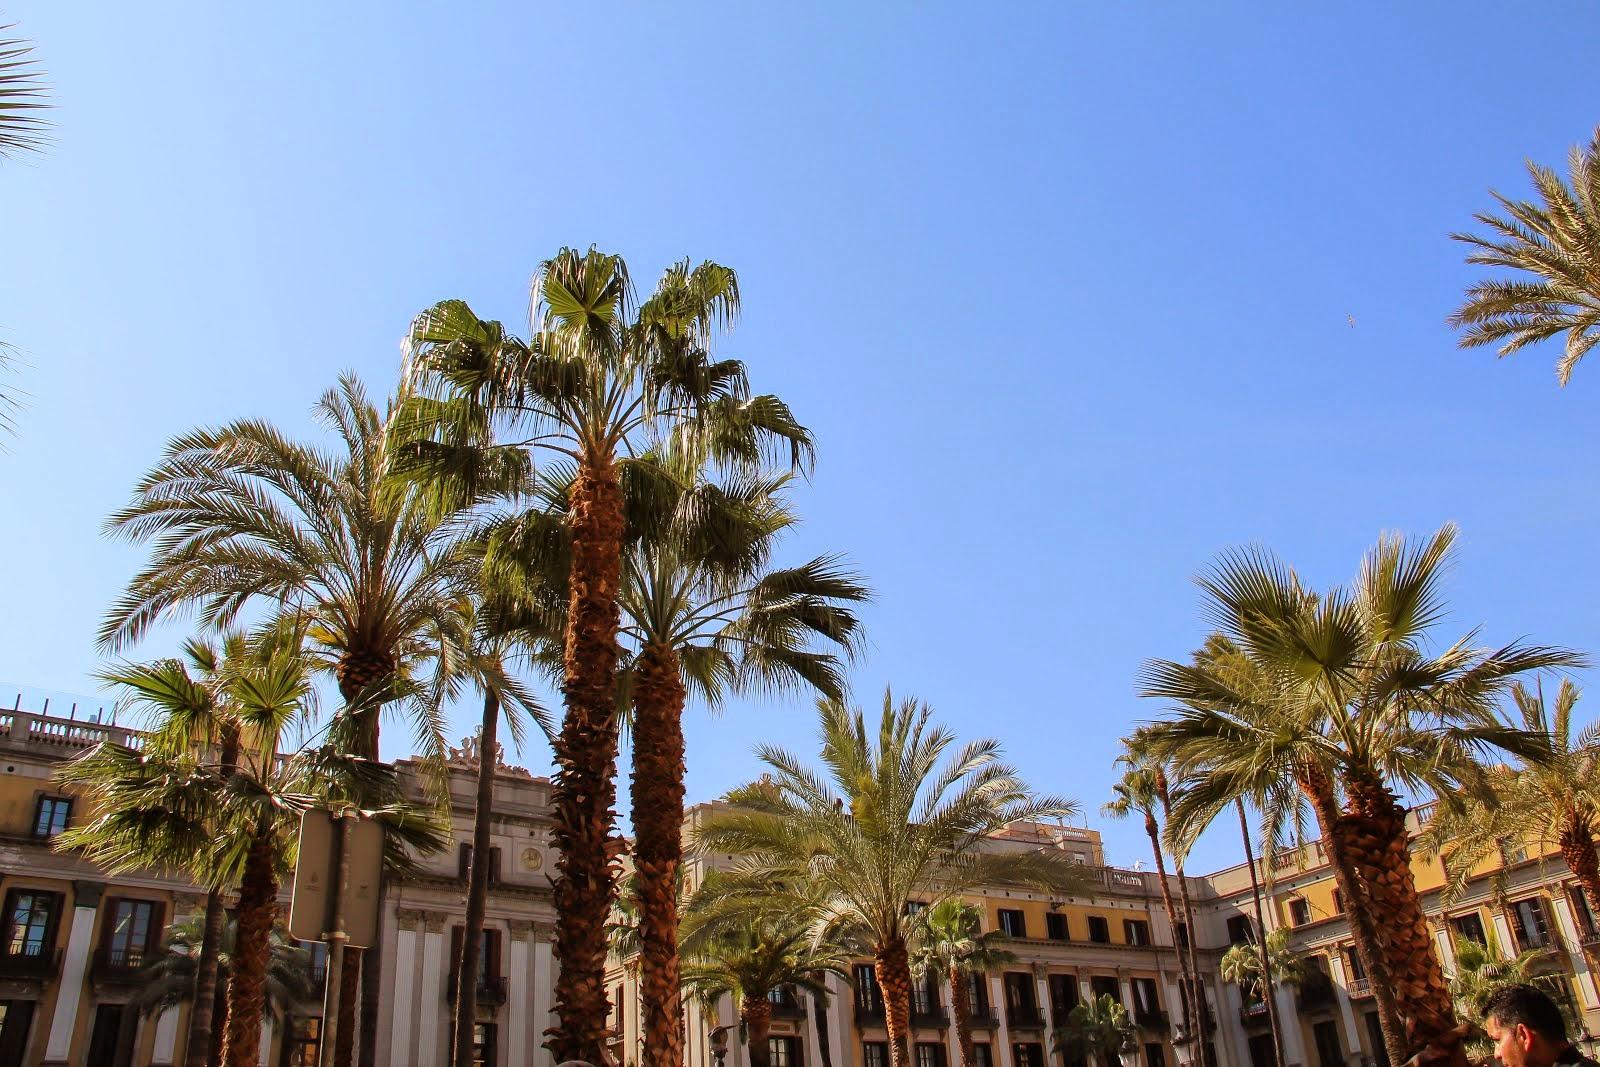 Barcelona Mars 2015